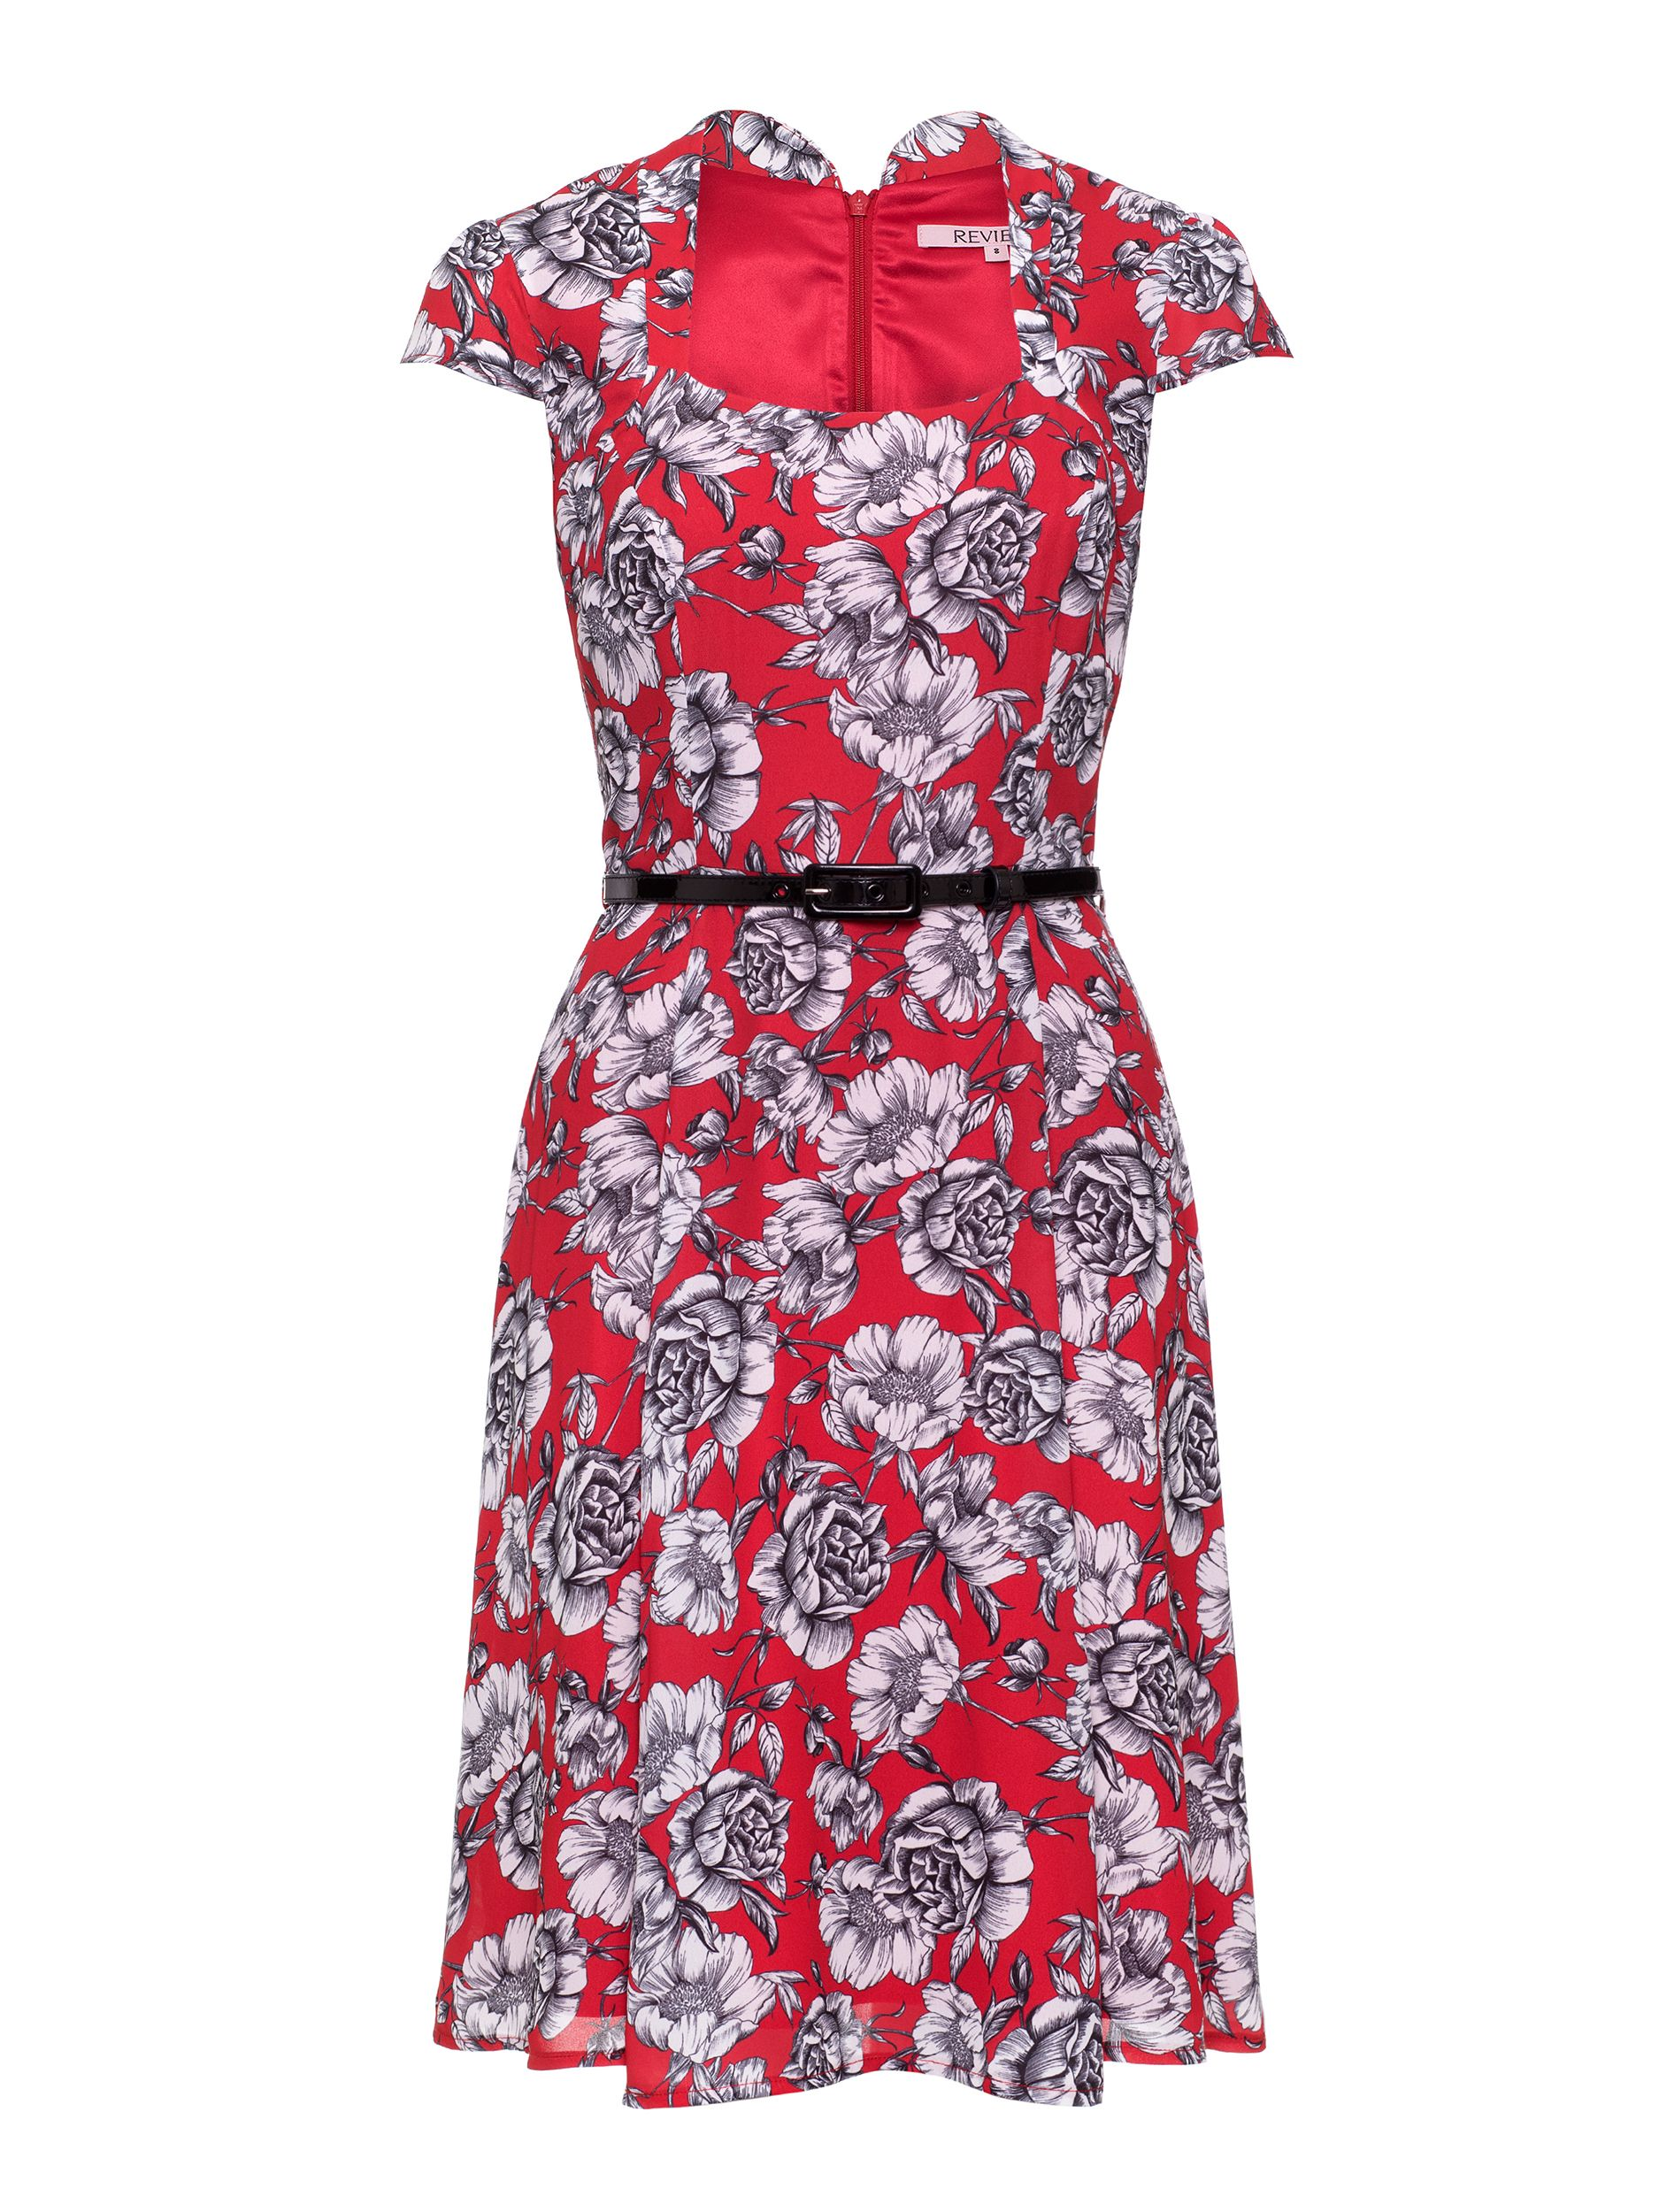 House Of Savoy Dress Red Multi I Dresses Dresses Online Dress Shopping Review Dresses